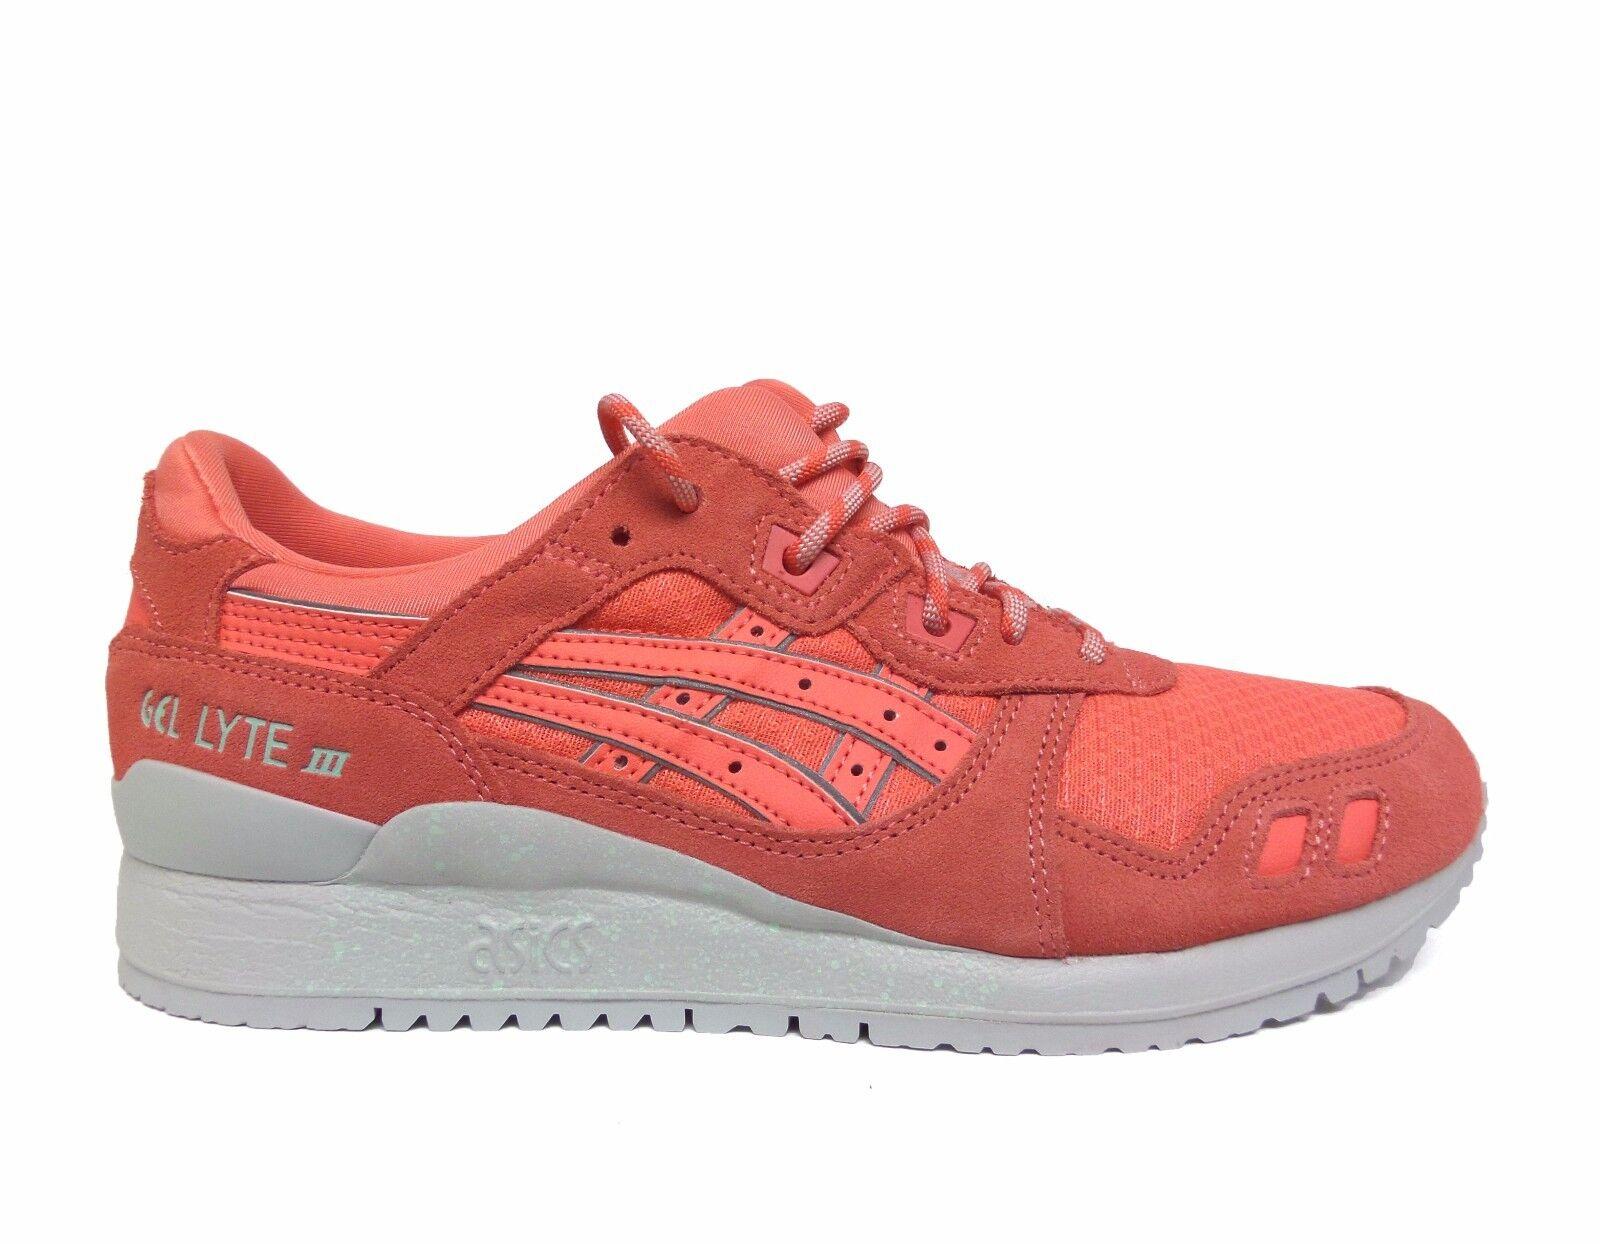 ASICS femmes  GEL-LYTE 3  Chaussures  Peach H7M5L-7676 b